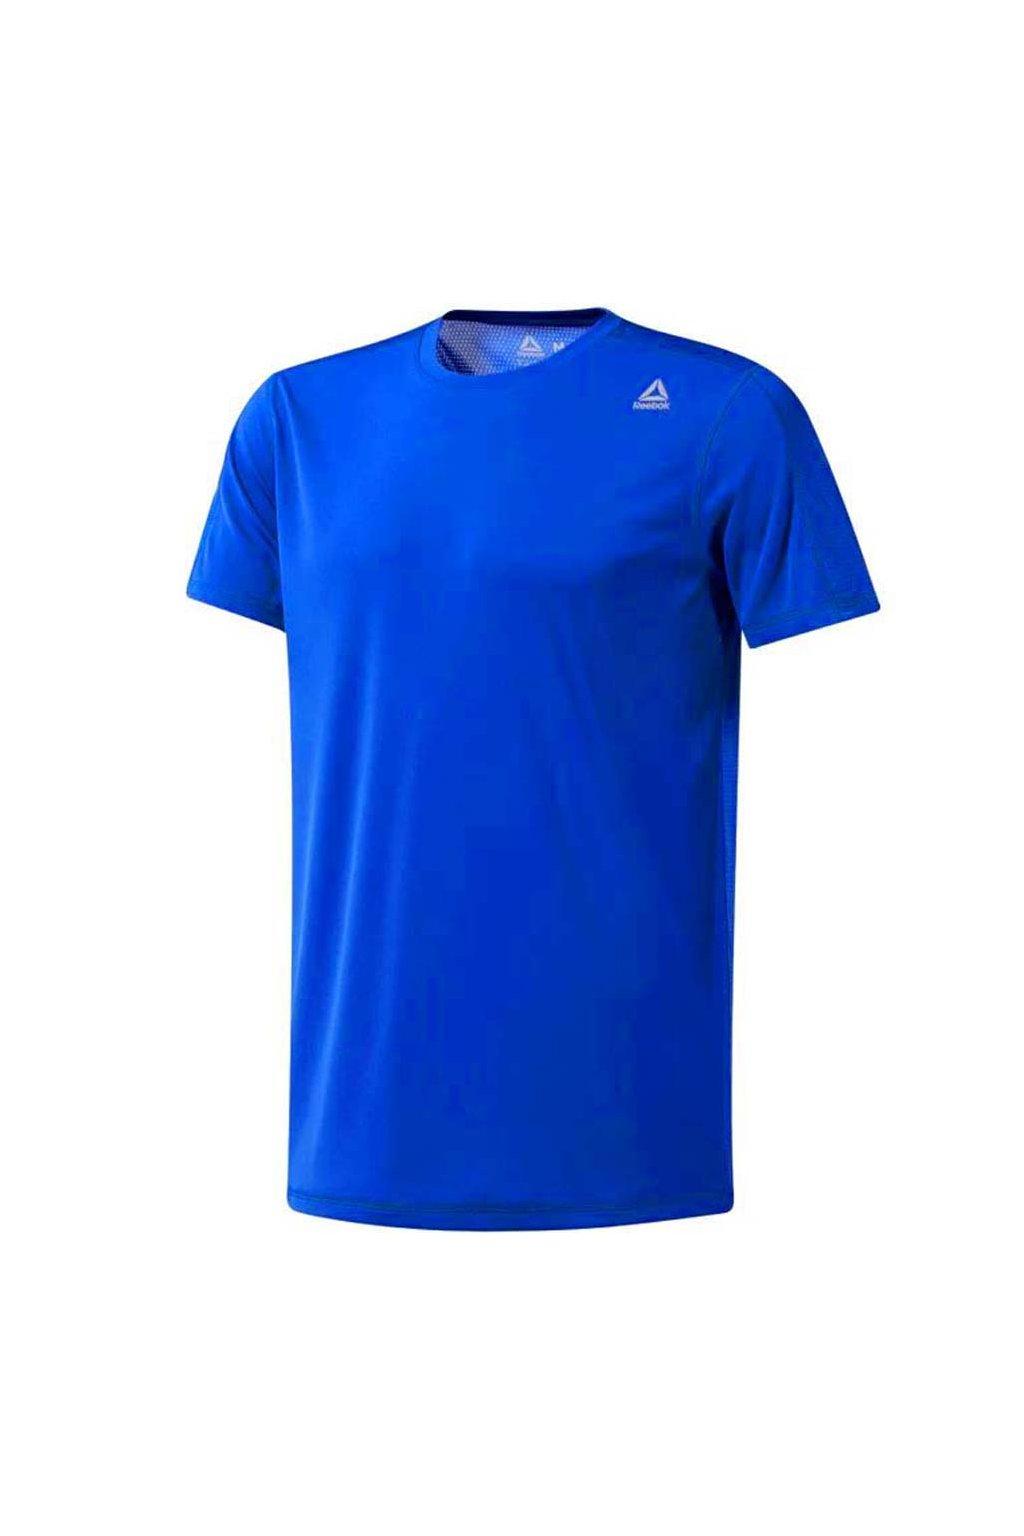 Pánske tričko Reebok Workout Tech Top modré DU2134